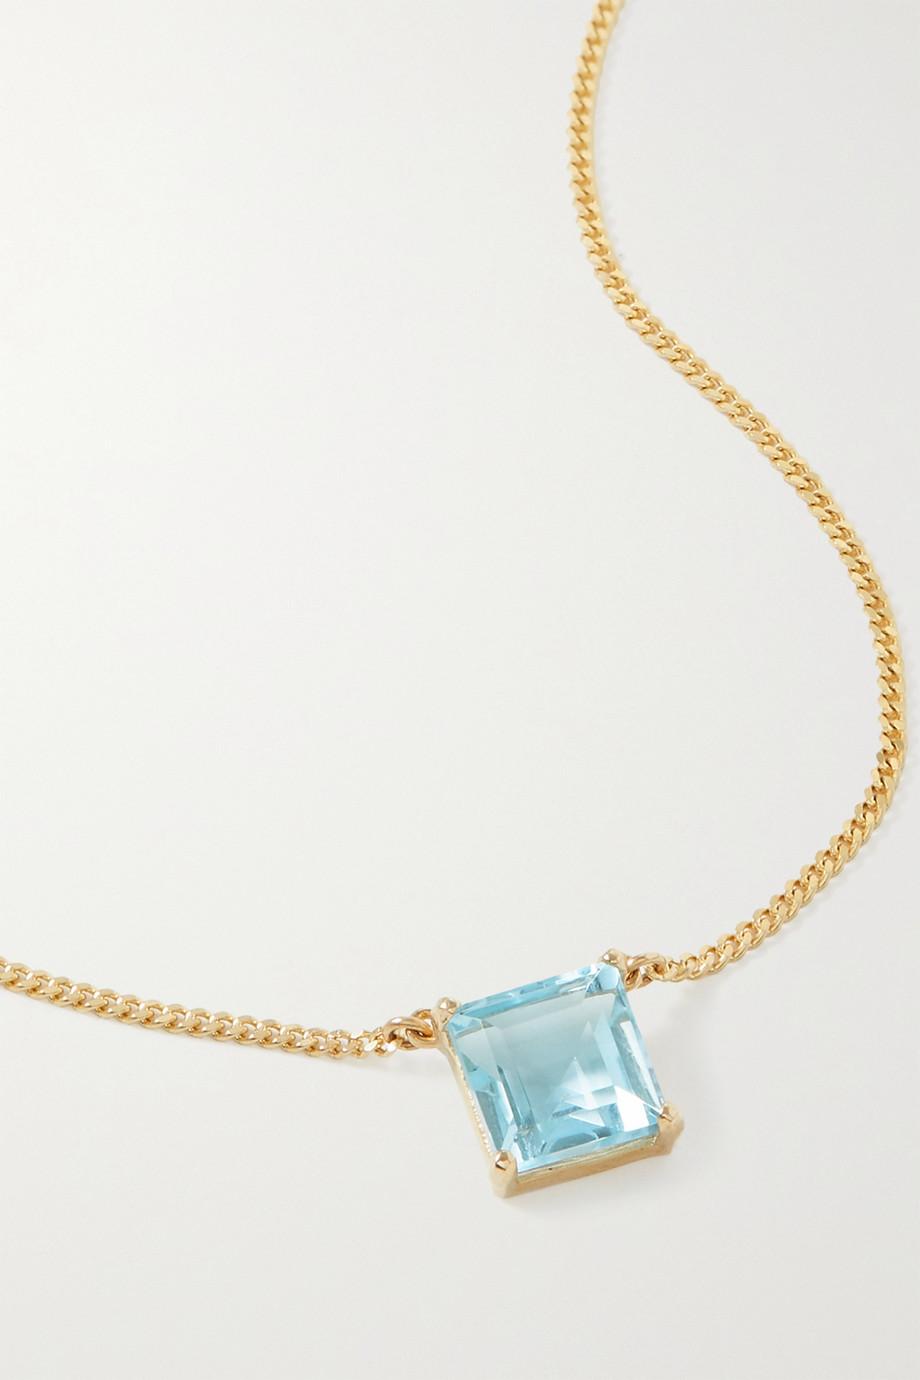 Loren Stewart Collier en or 14 carats (585/1000) et topaze Bonbon